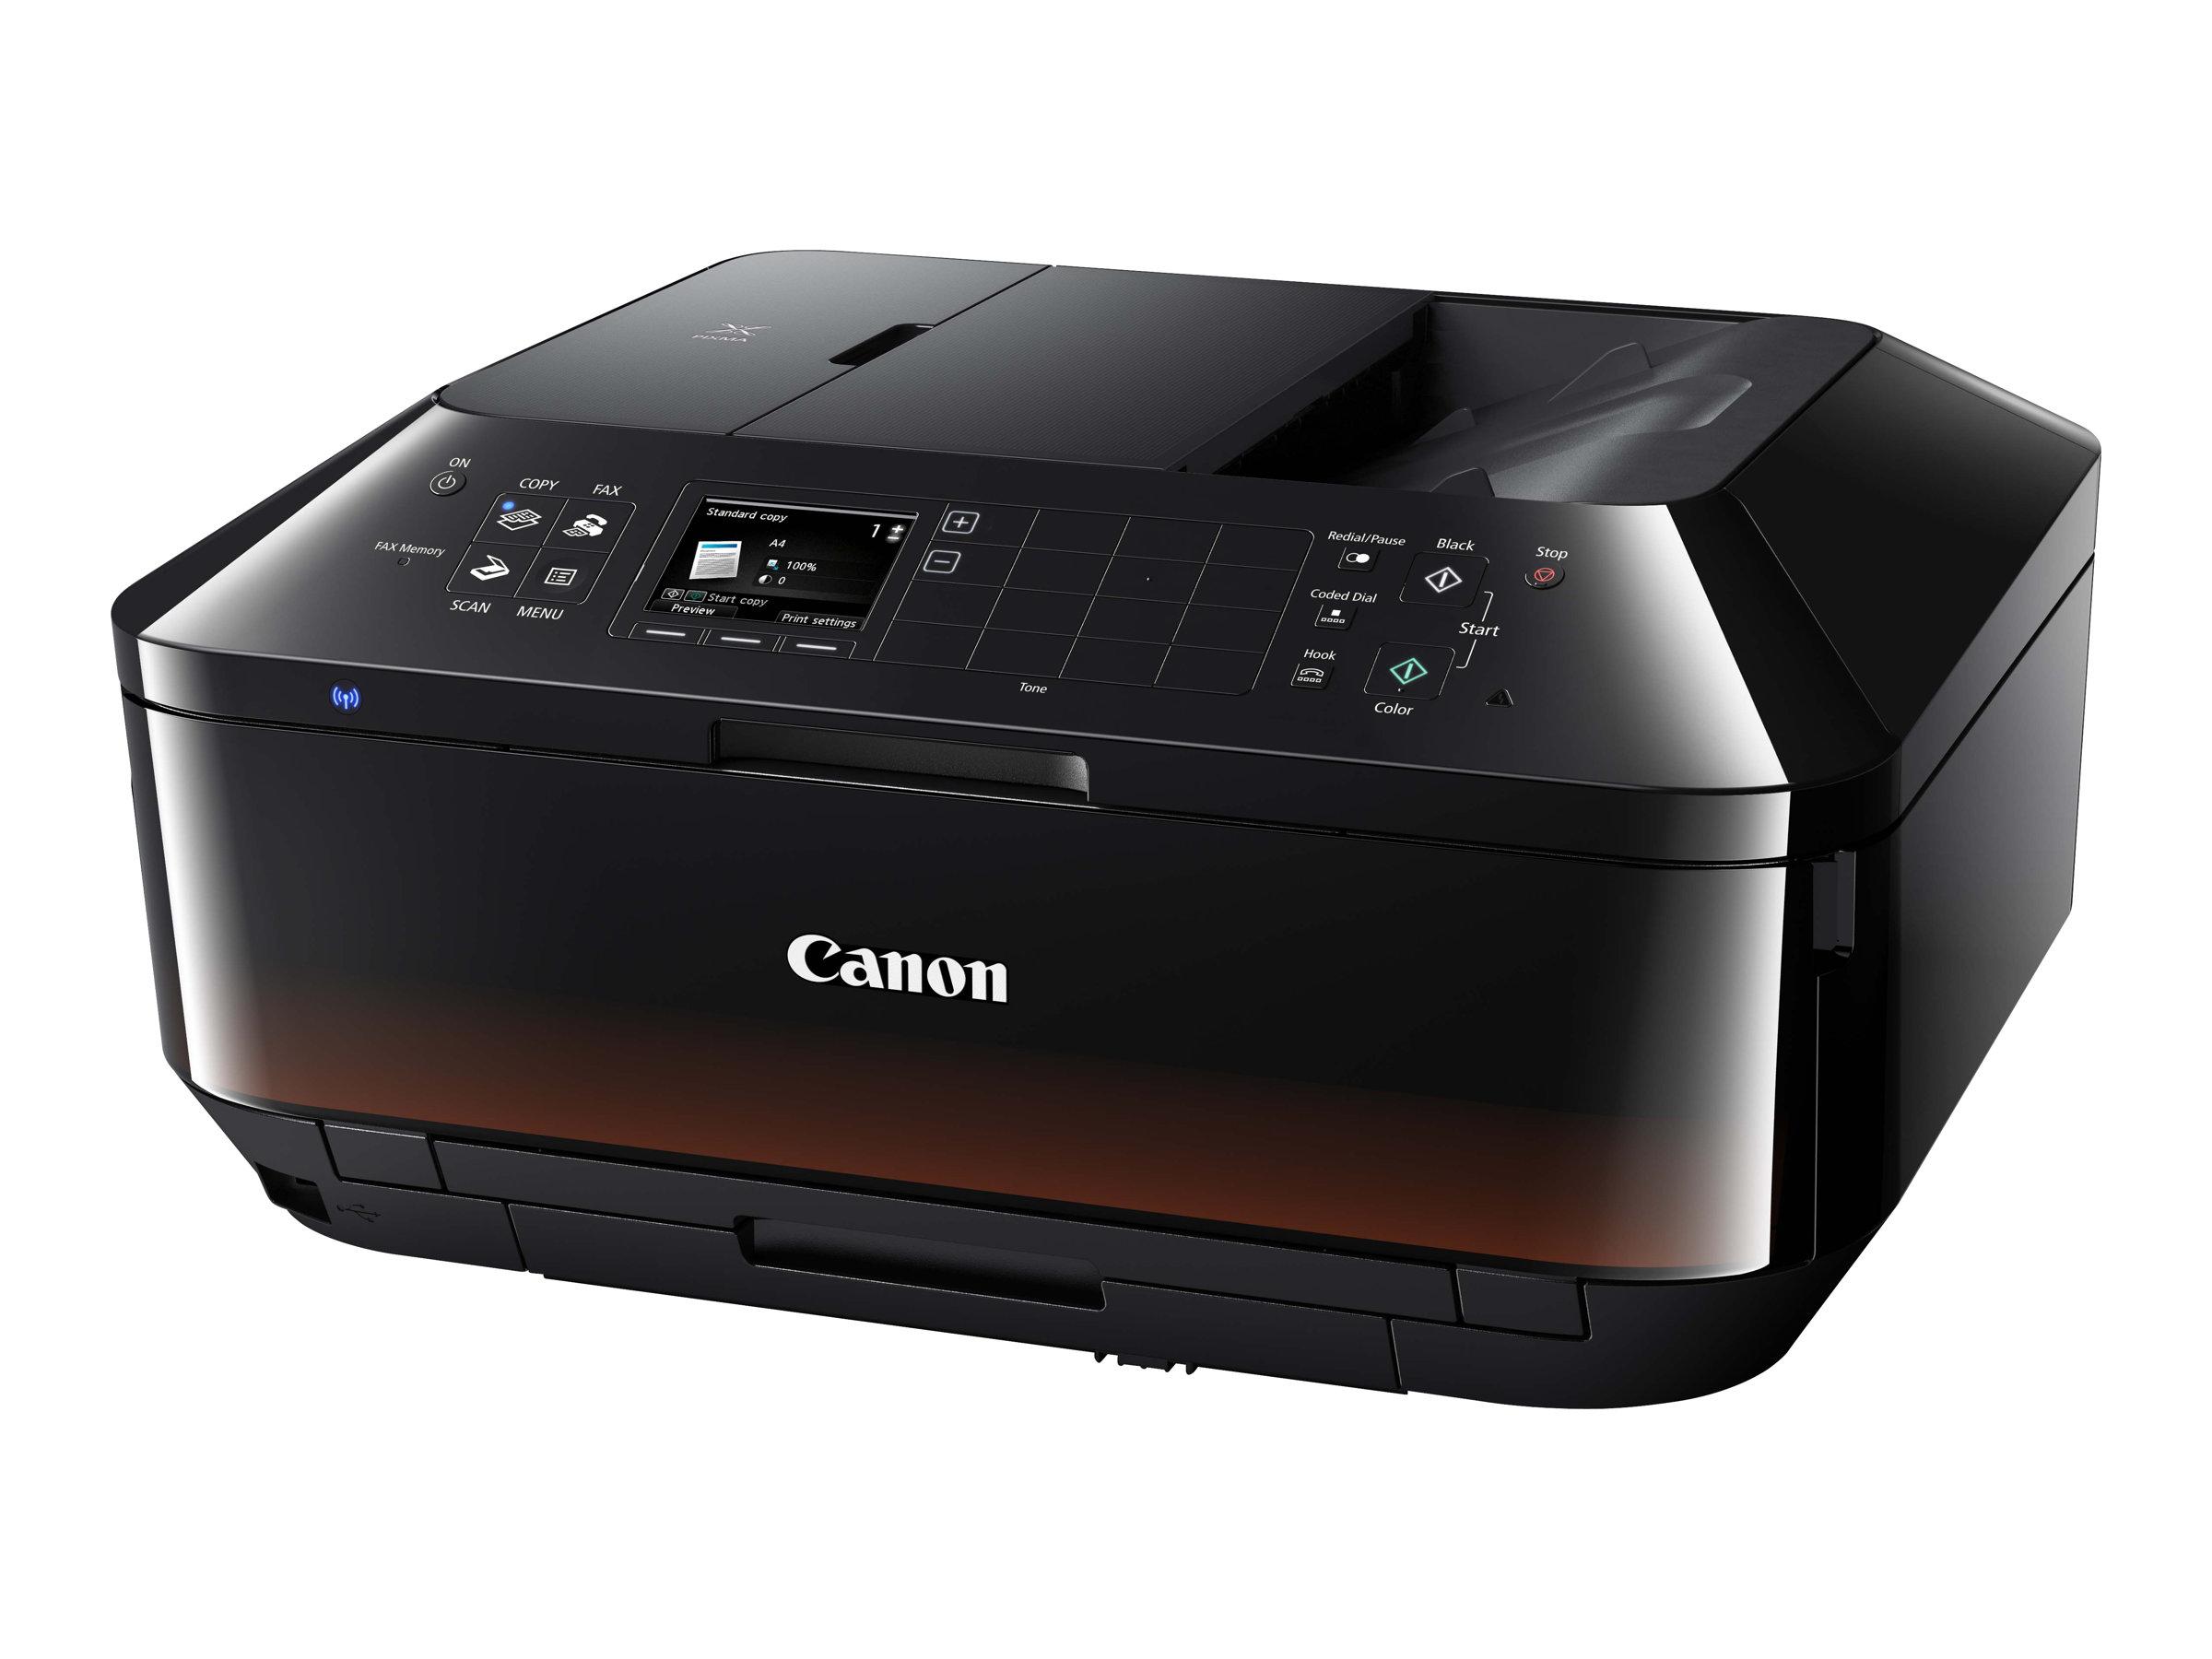 Vorschau: Canon PIXMA MX925 - Multifunktionsdrucker